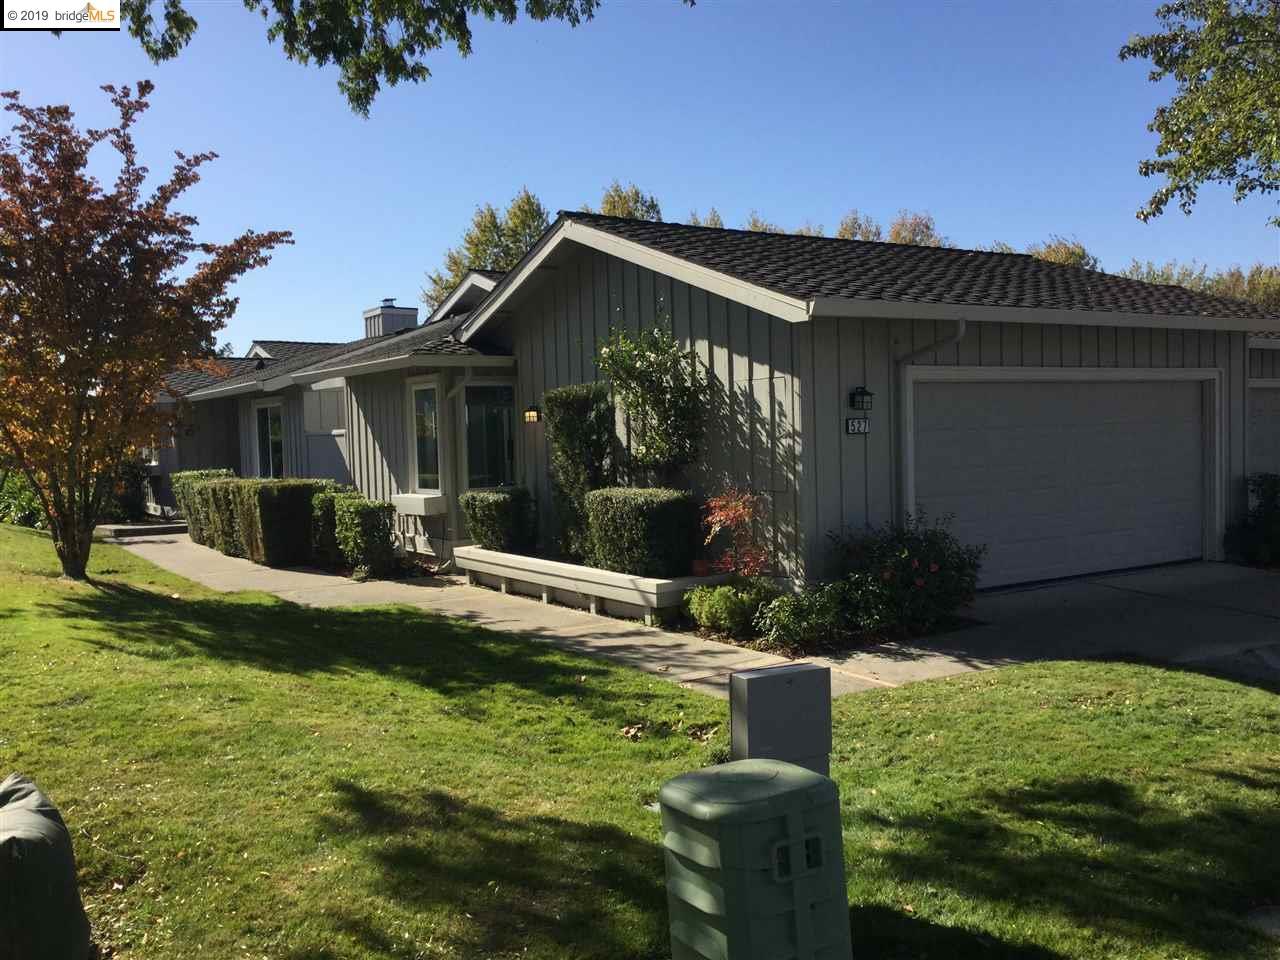 527 Rolling Hills Ln Danville, CA 94526